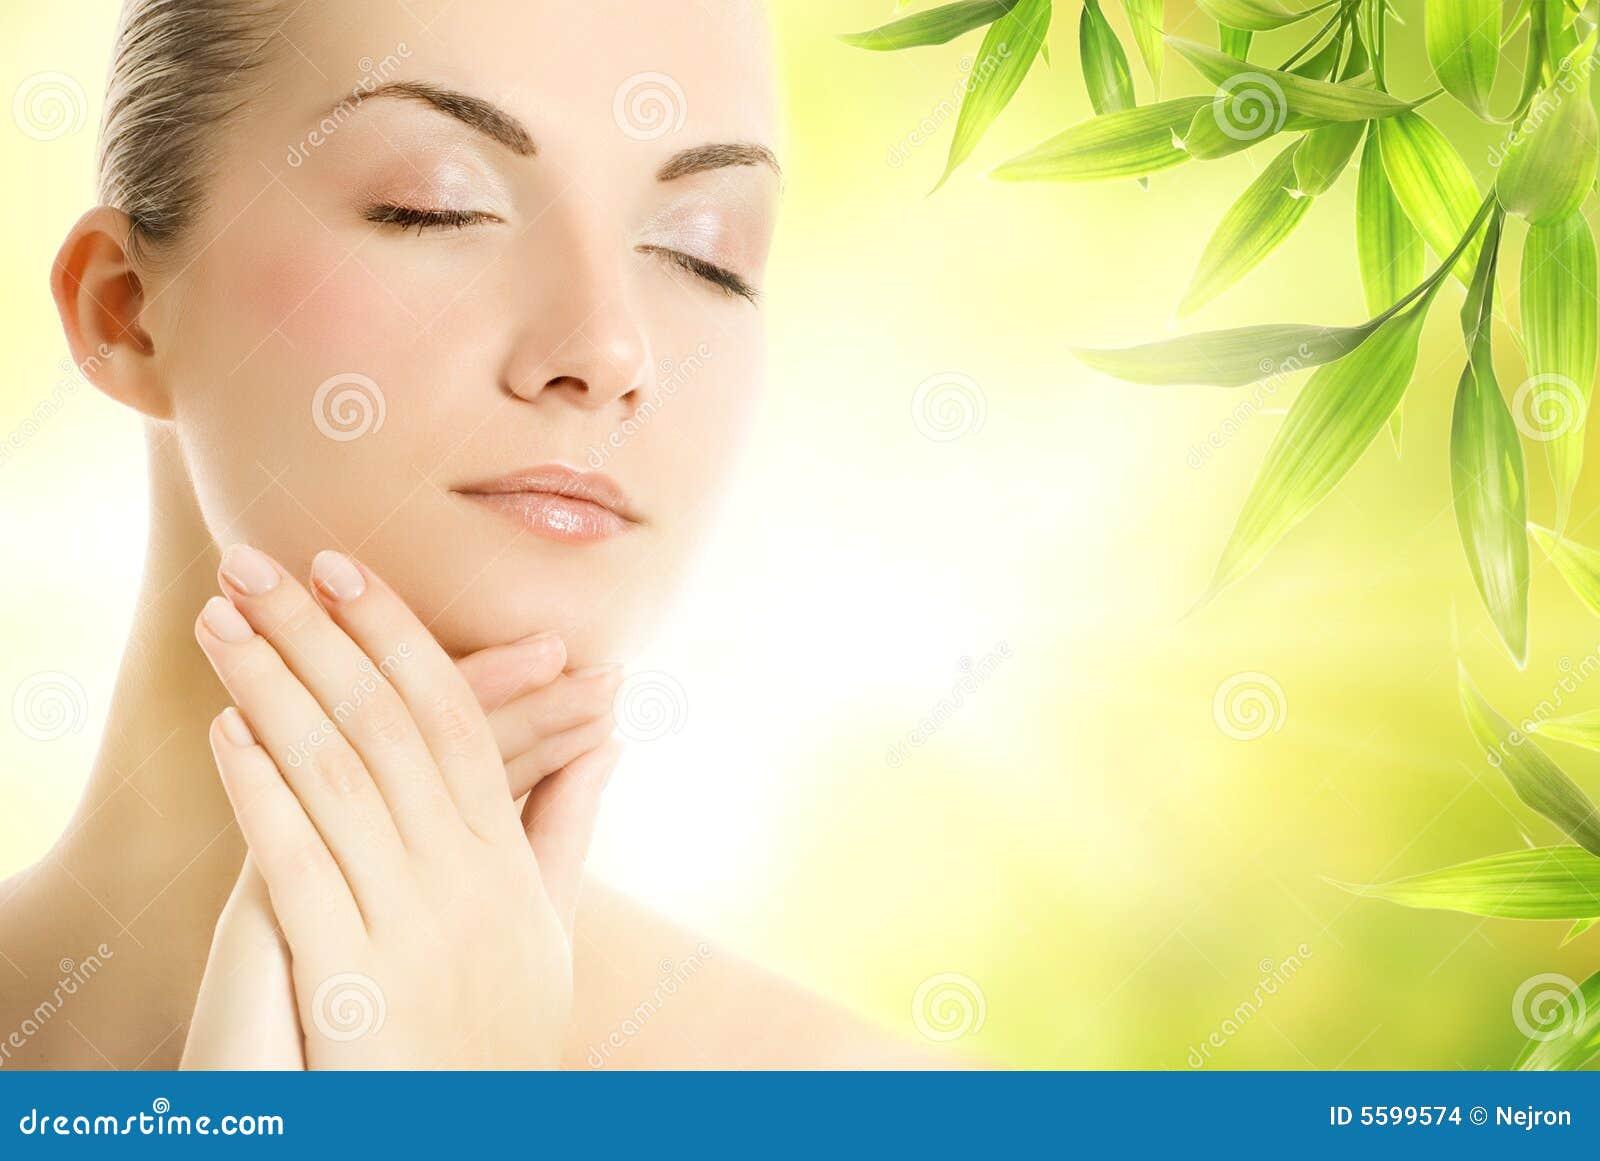 Woman applying organic cosmetics to her skin